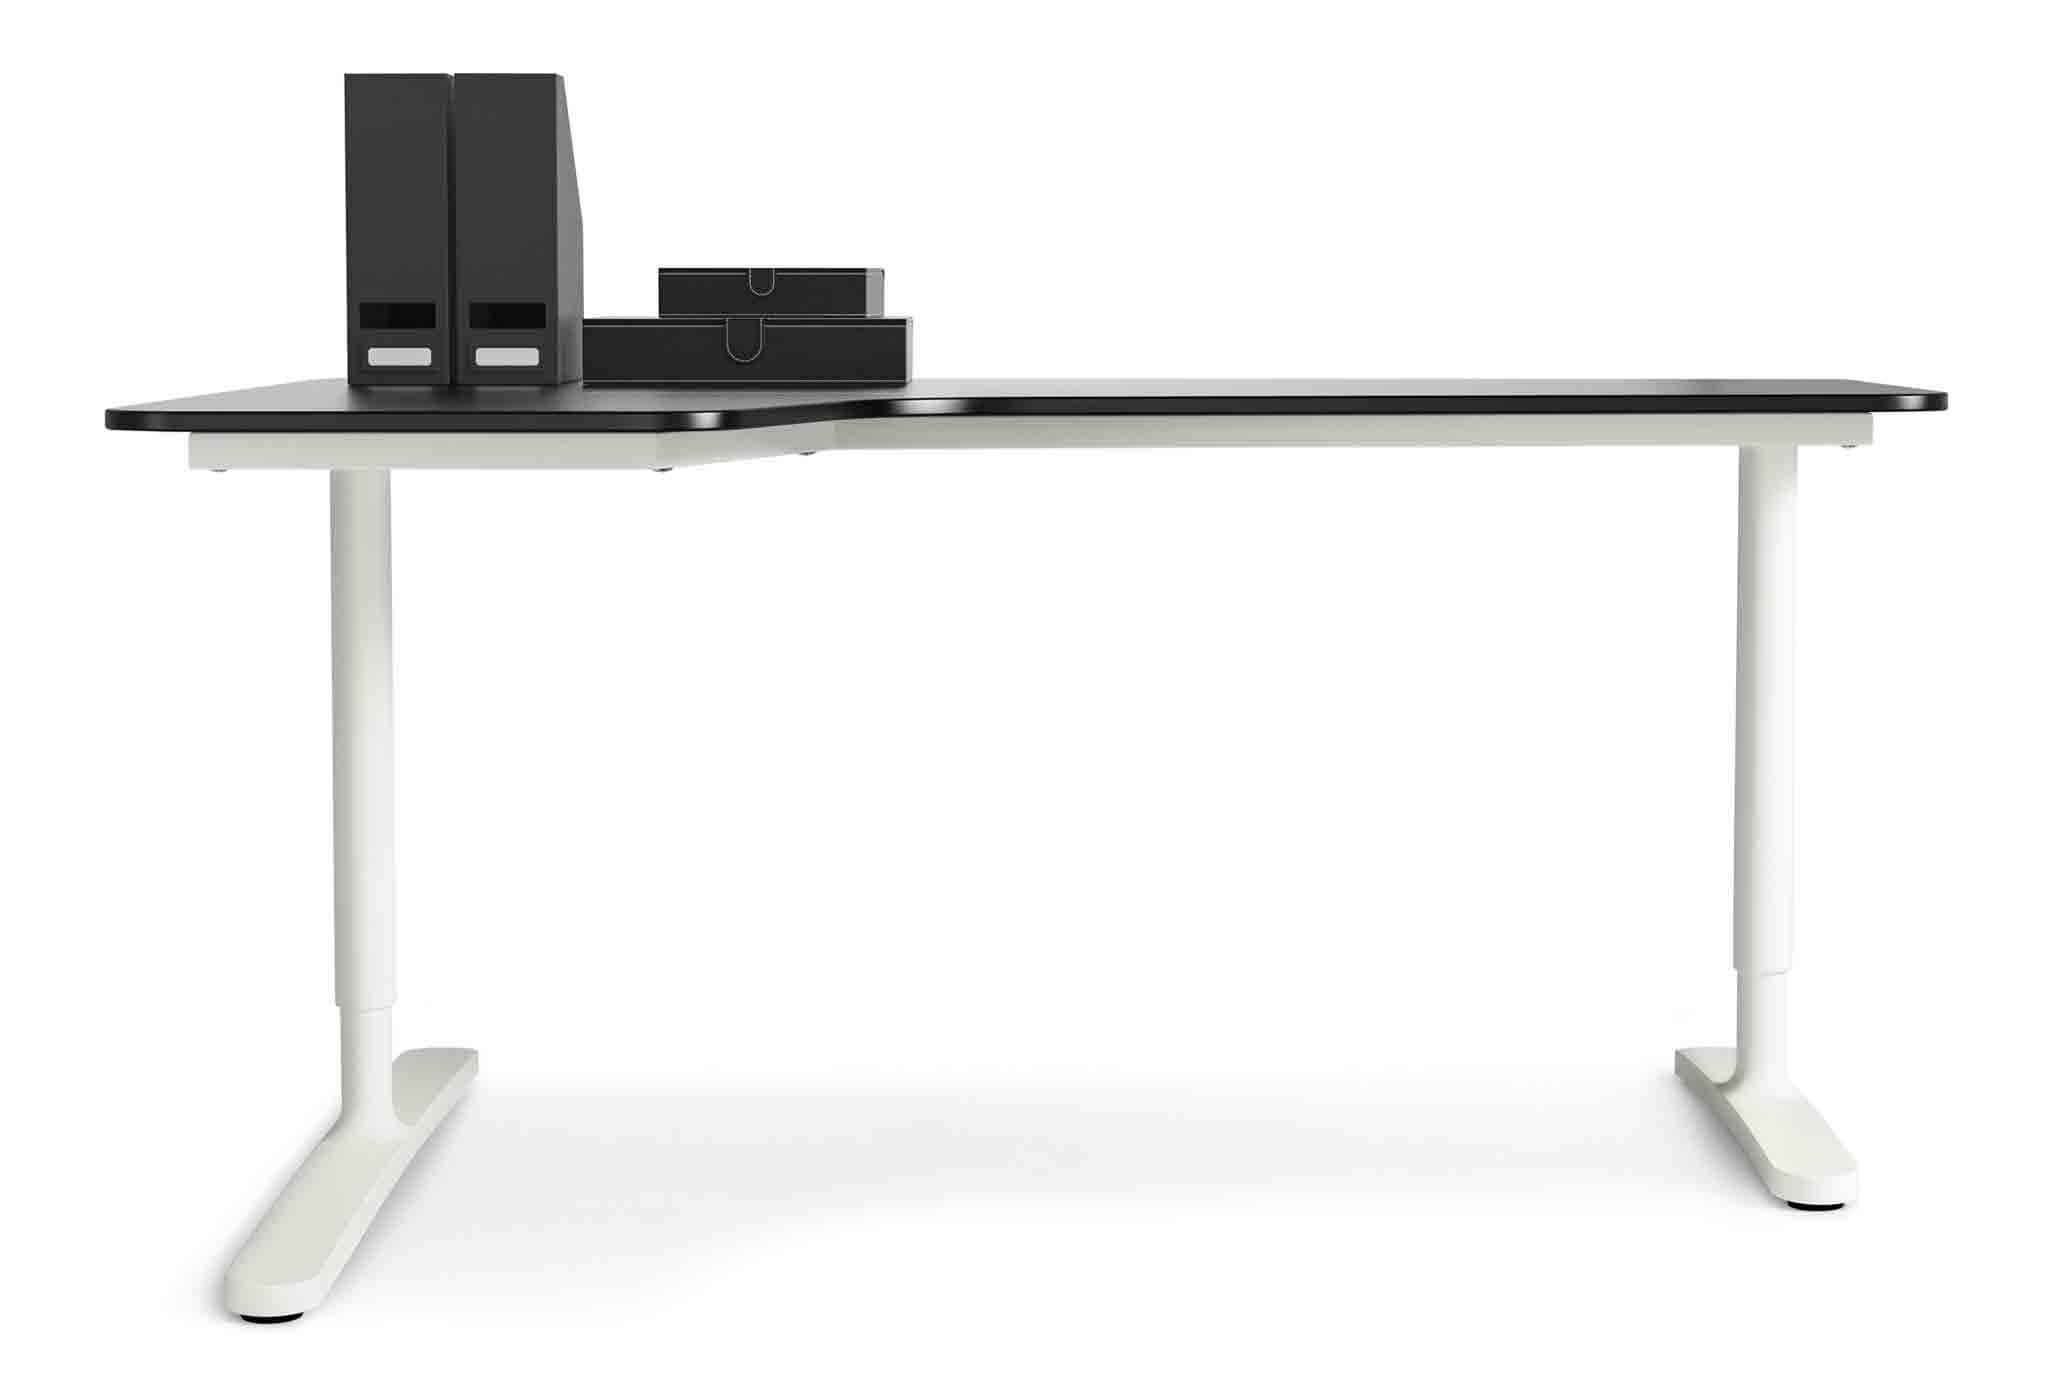 Ikea Mesas Oficina – Sharon Leal